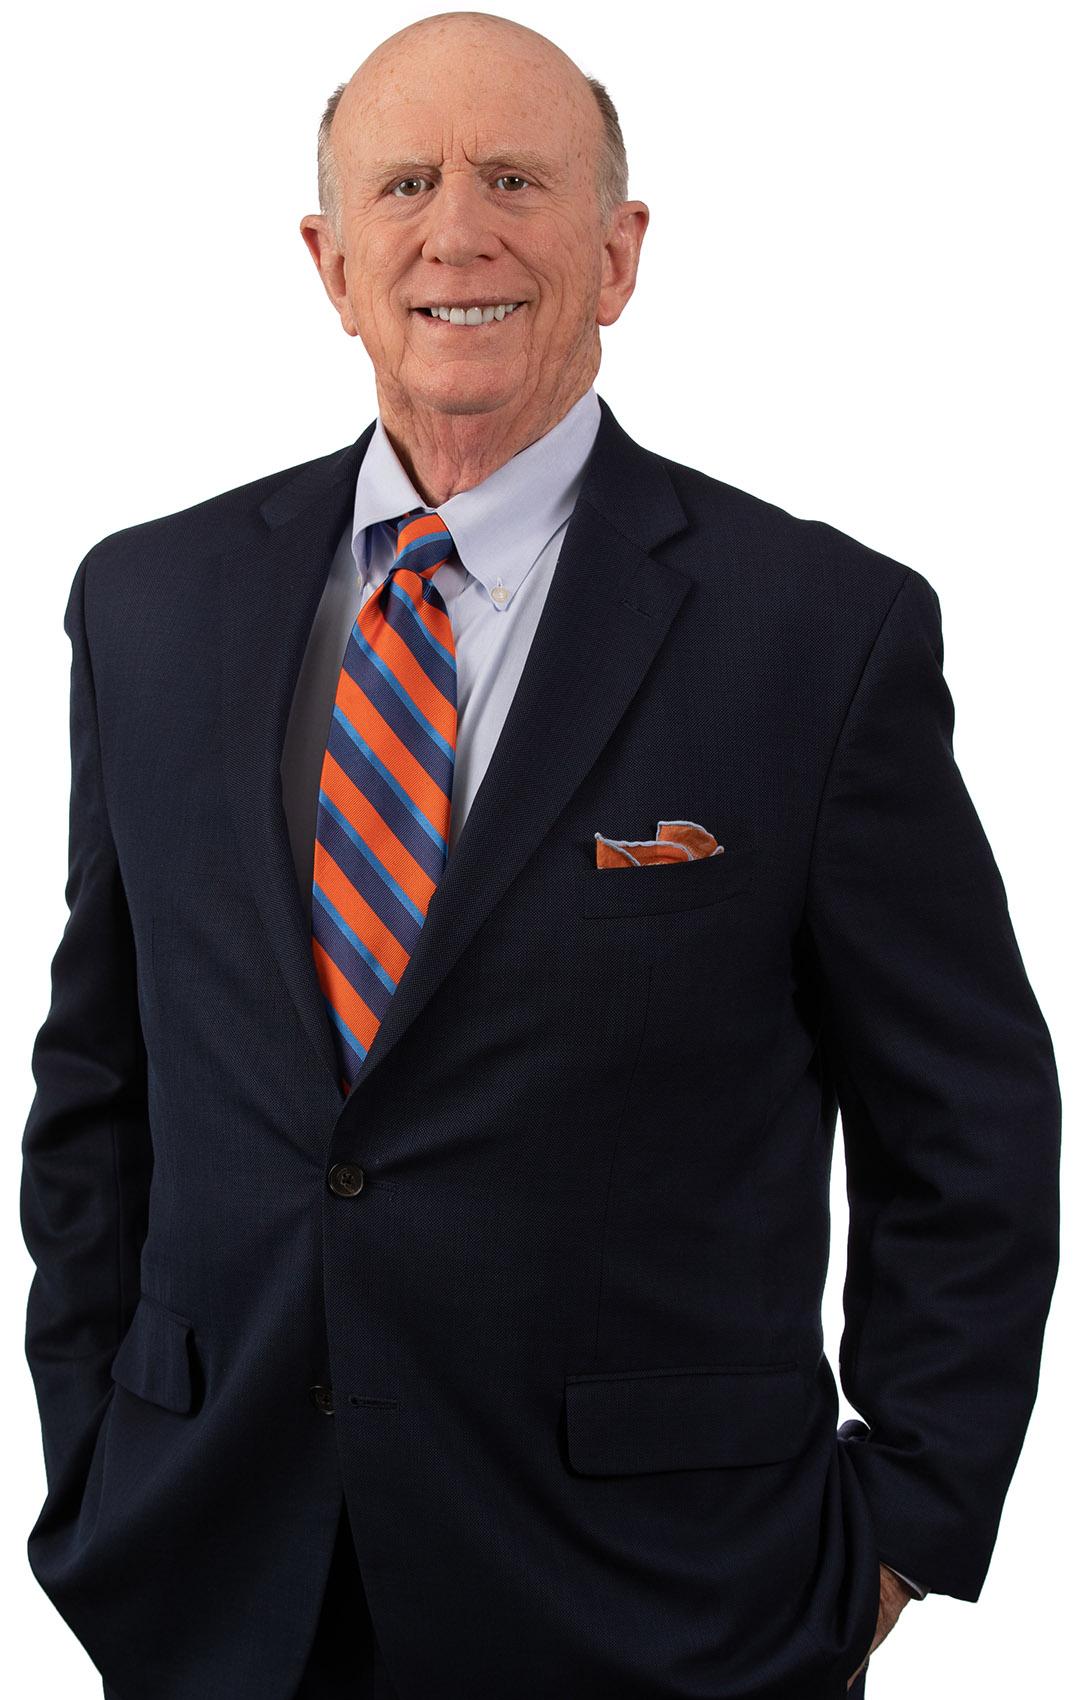 David H. Wilkins